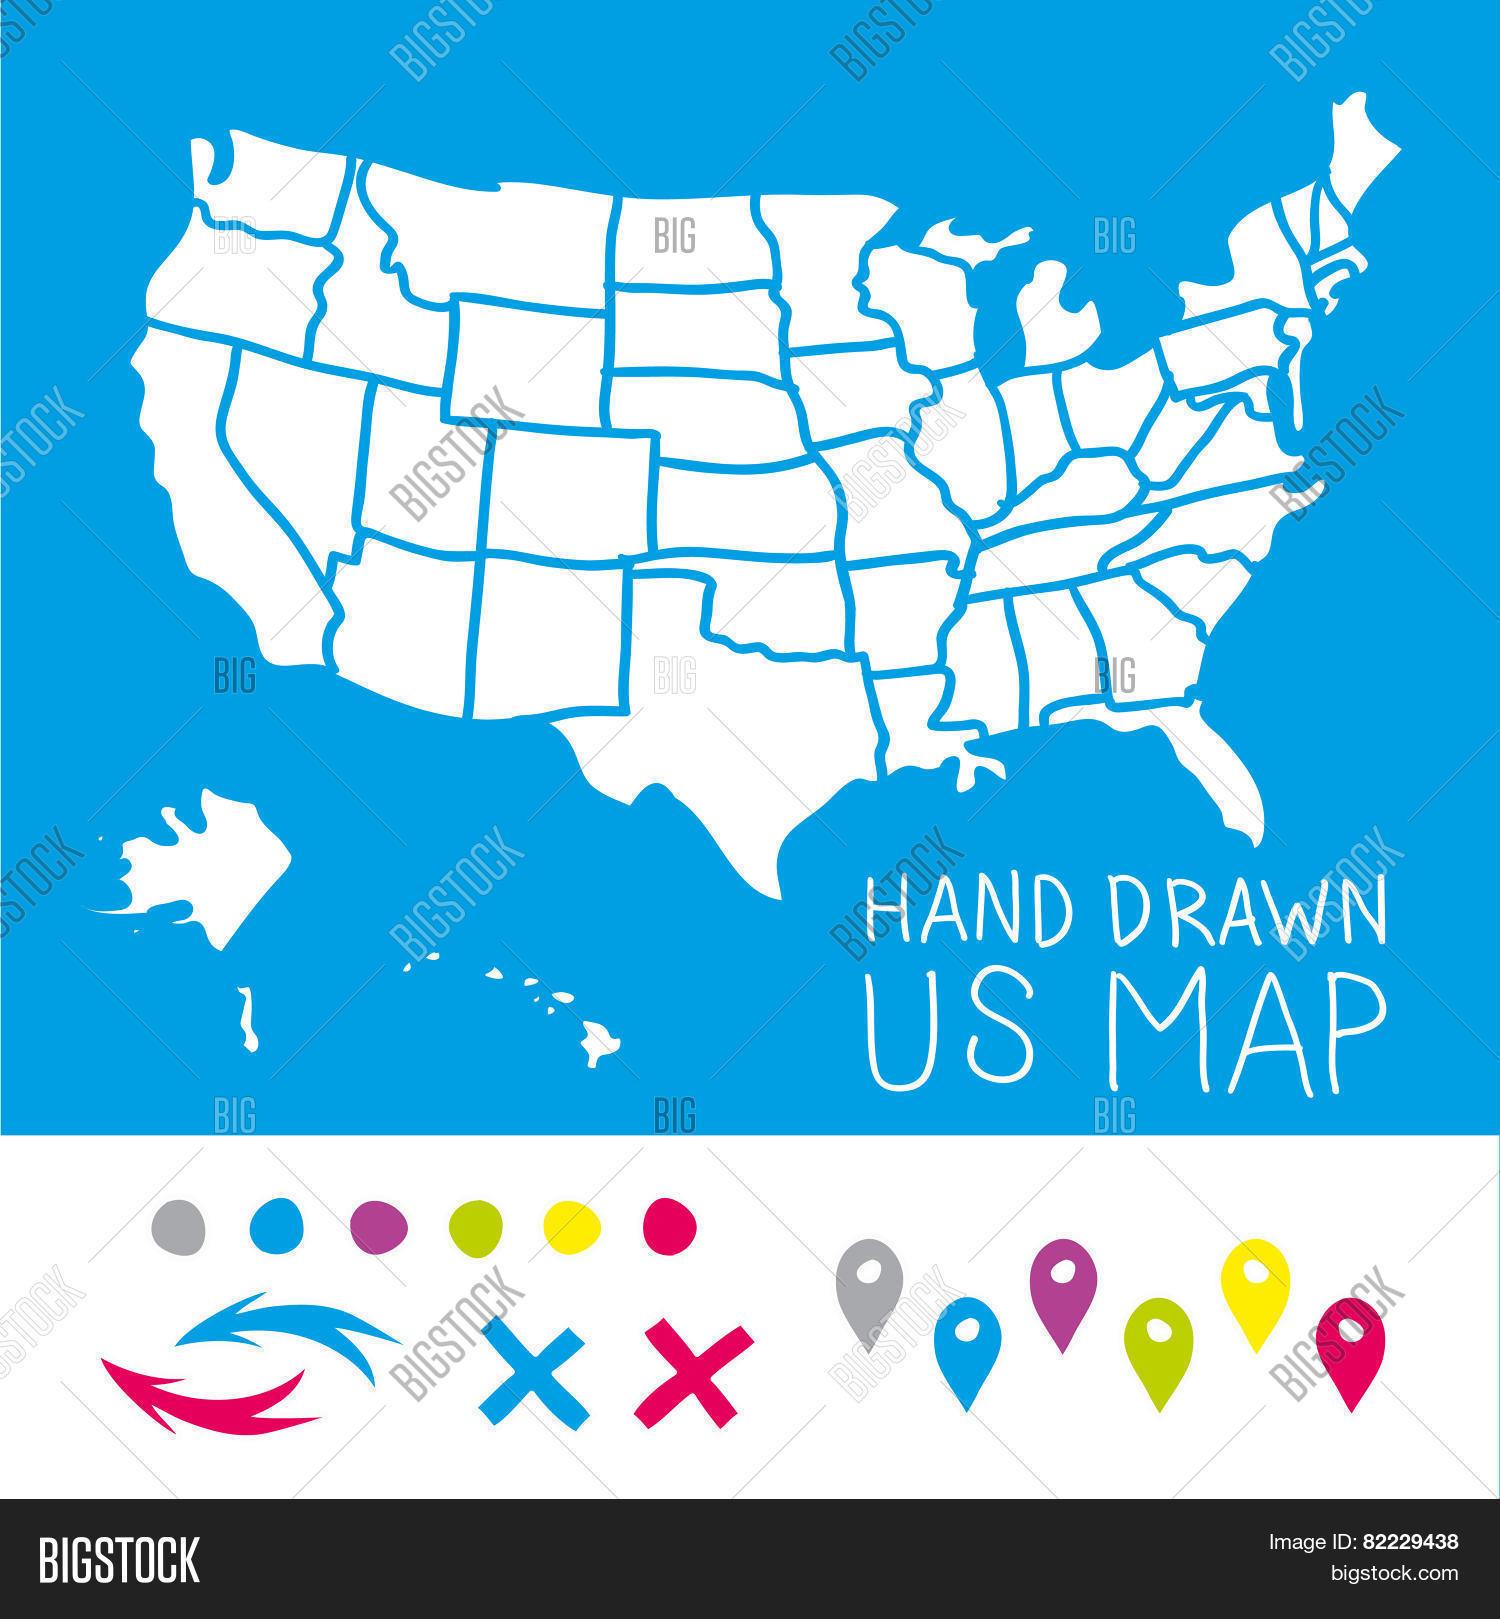 Hand Drawn US Map Vector & Photo (Free Trial) | Bigstock